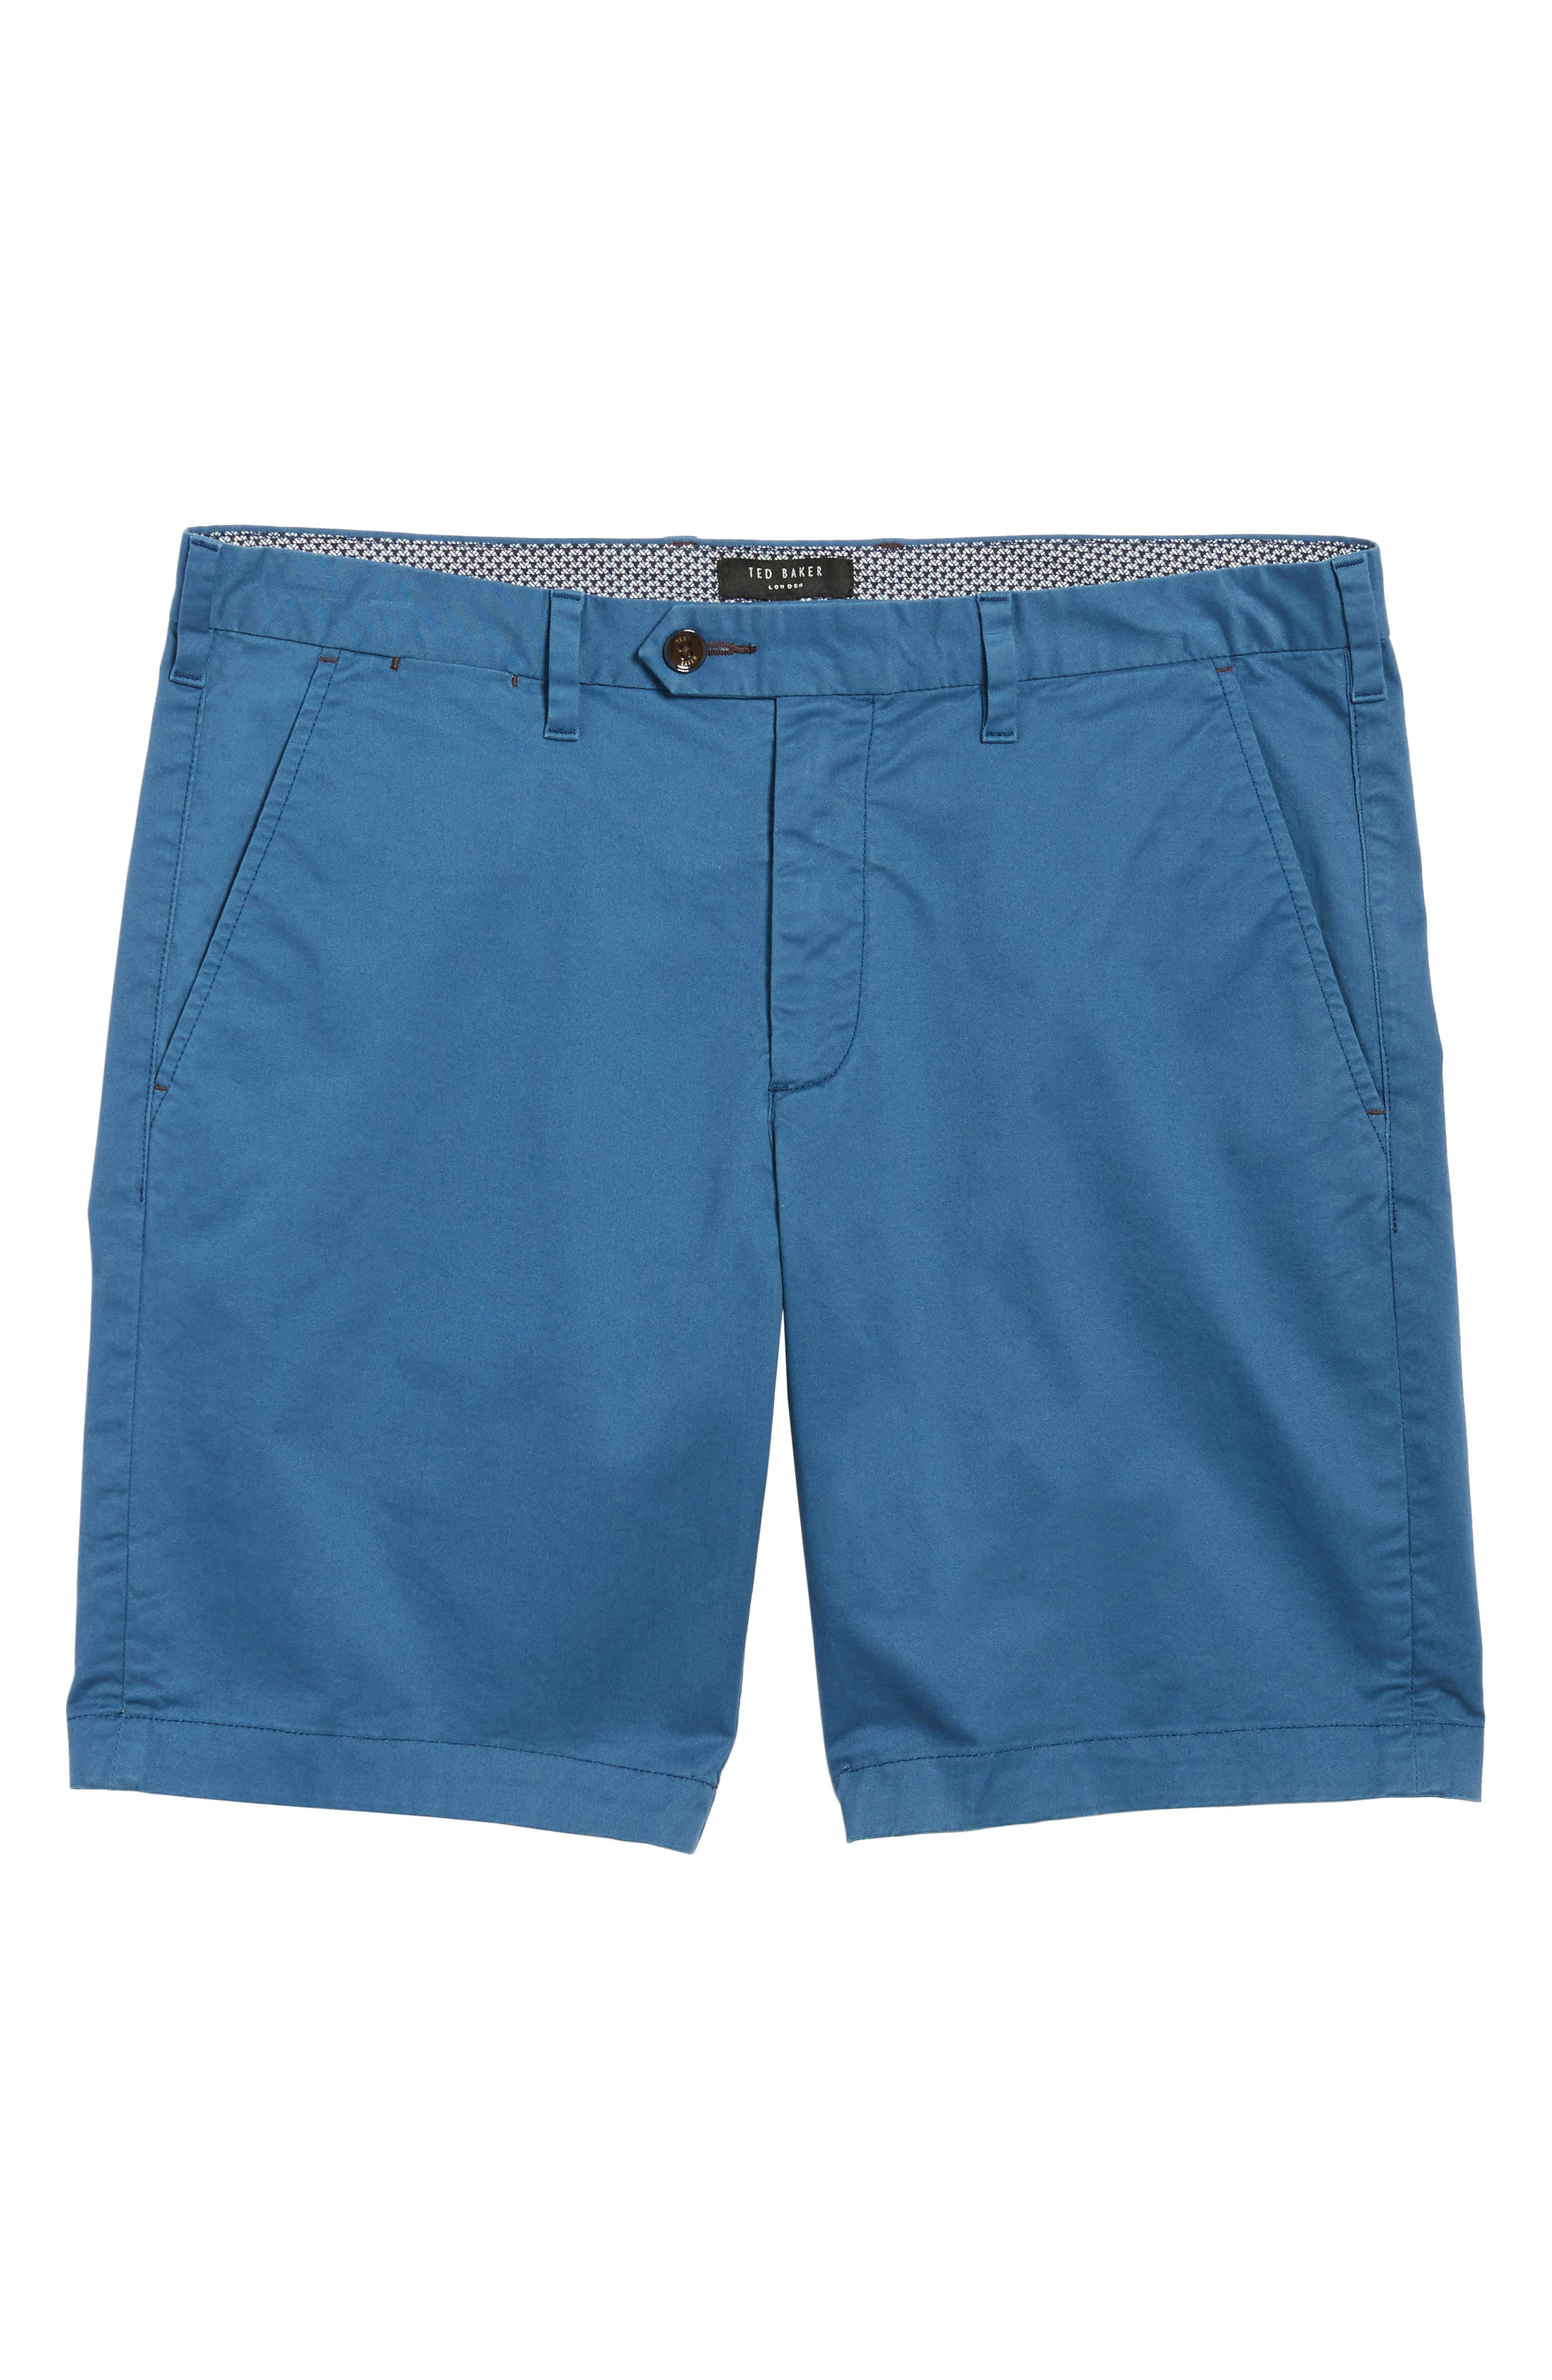 Proshor Slim Fit Chino Shorts,                             Alternate thumbnail 11, color,                             Dark Blue